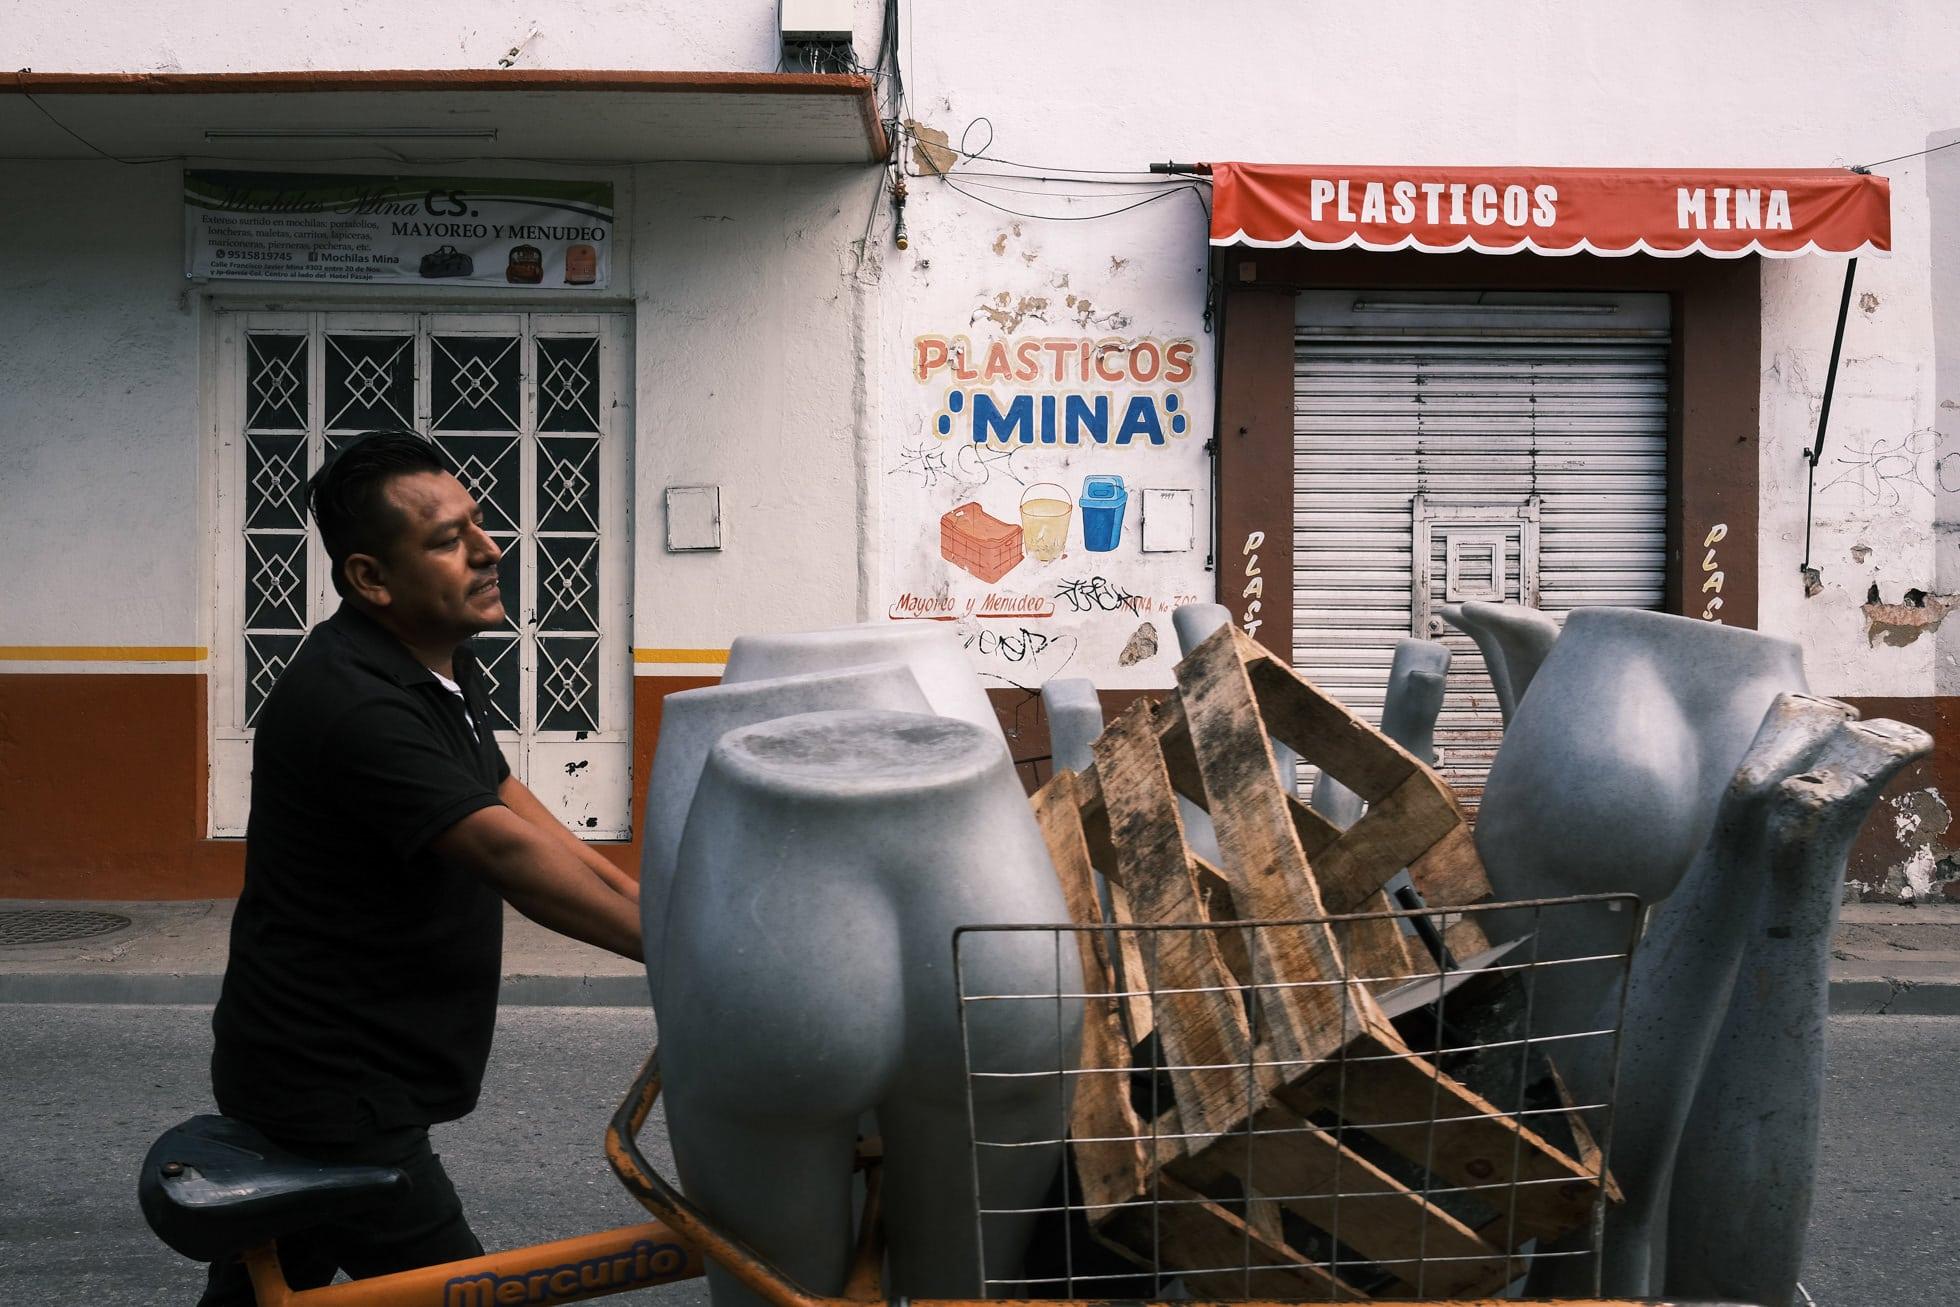 fujifilm-x-pro3-mexico-street-photography-70